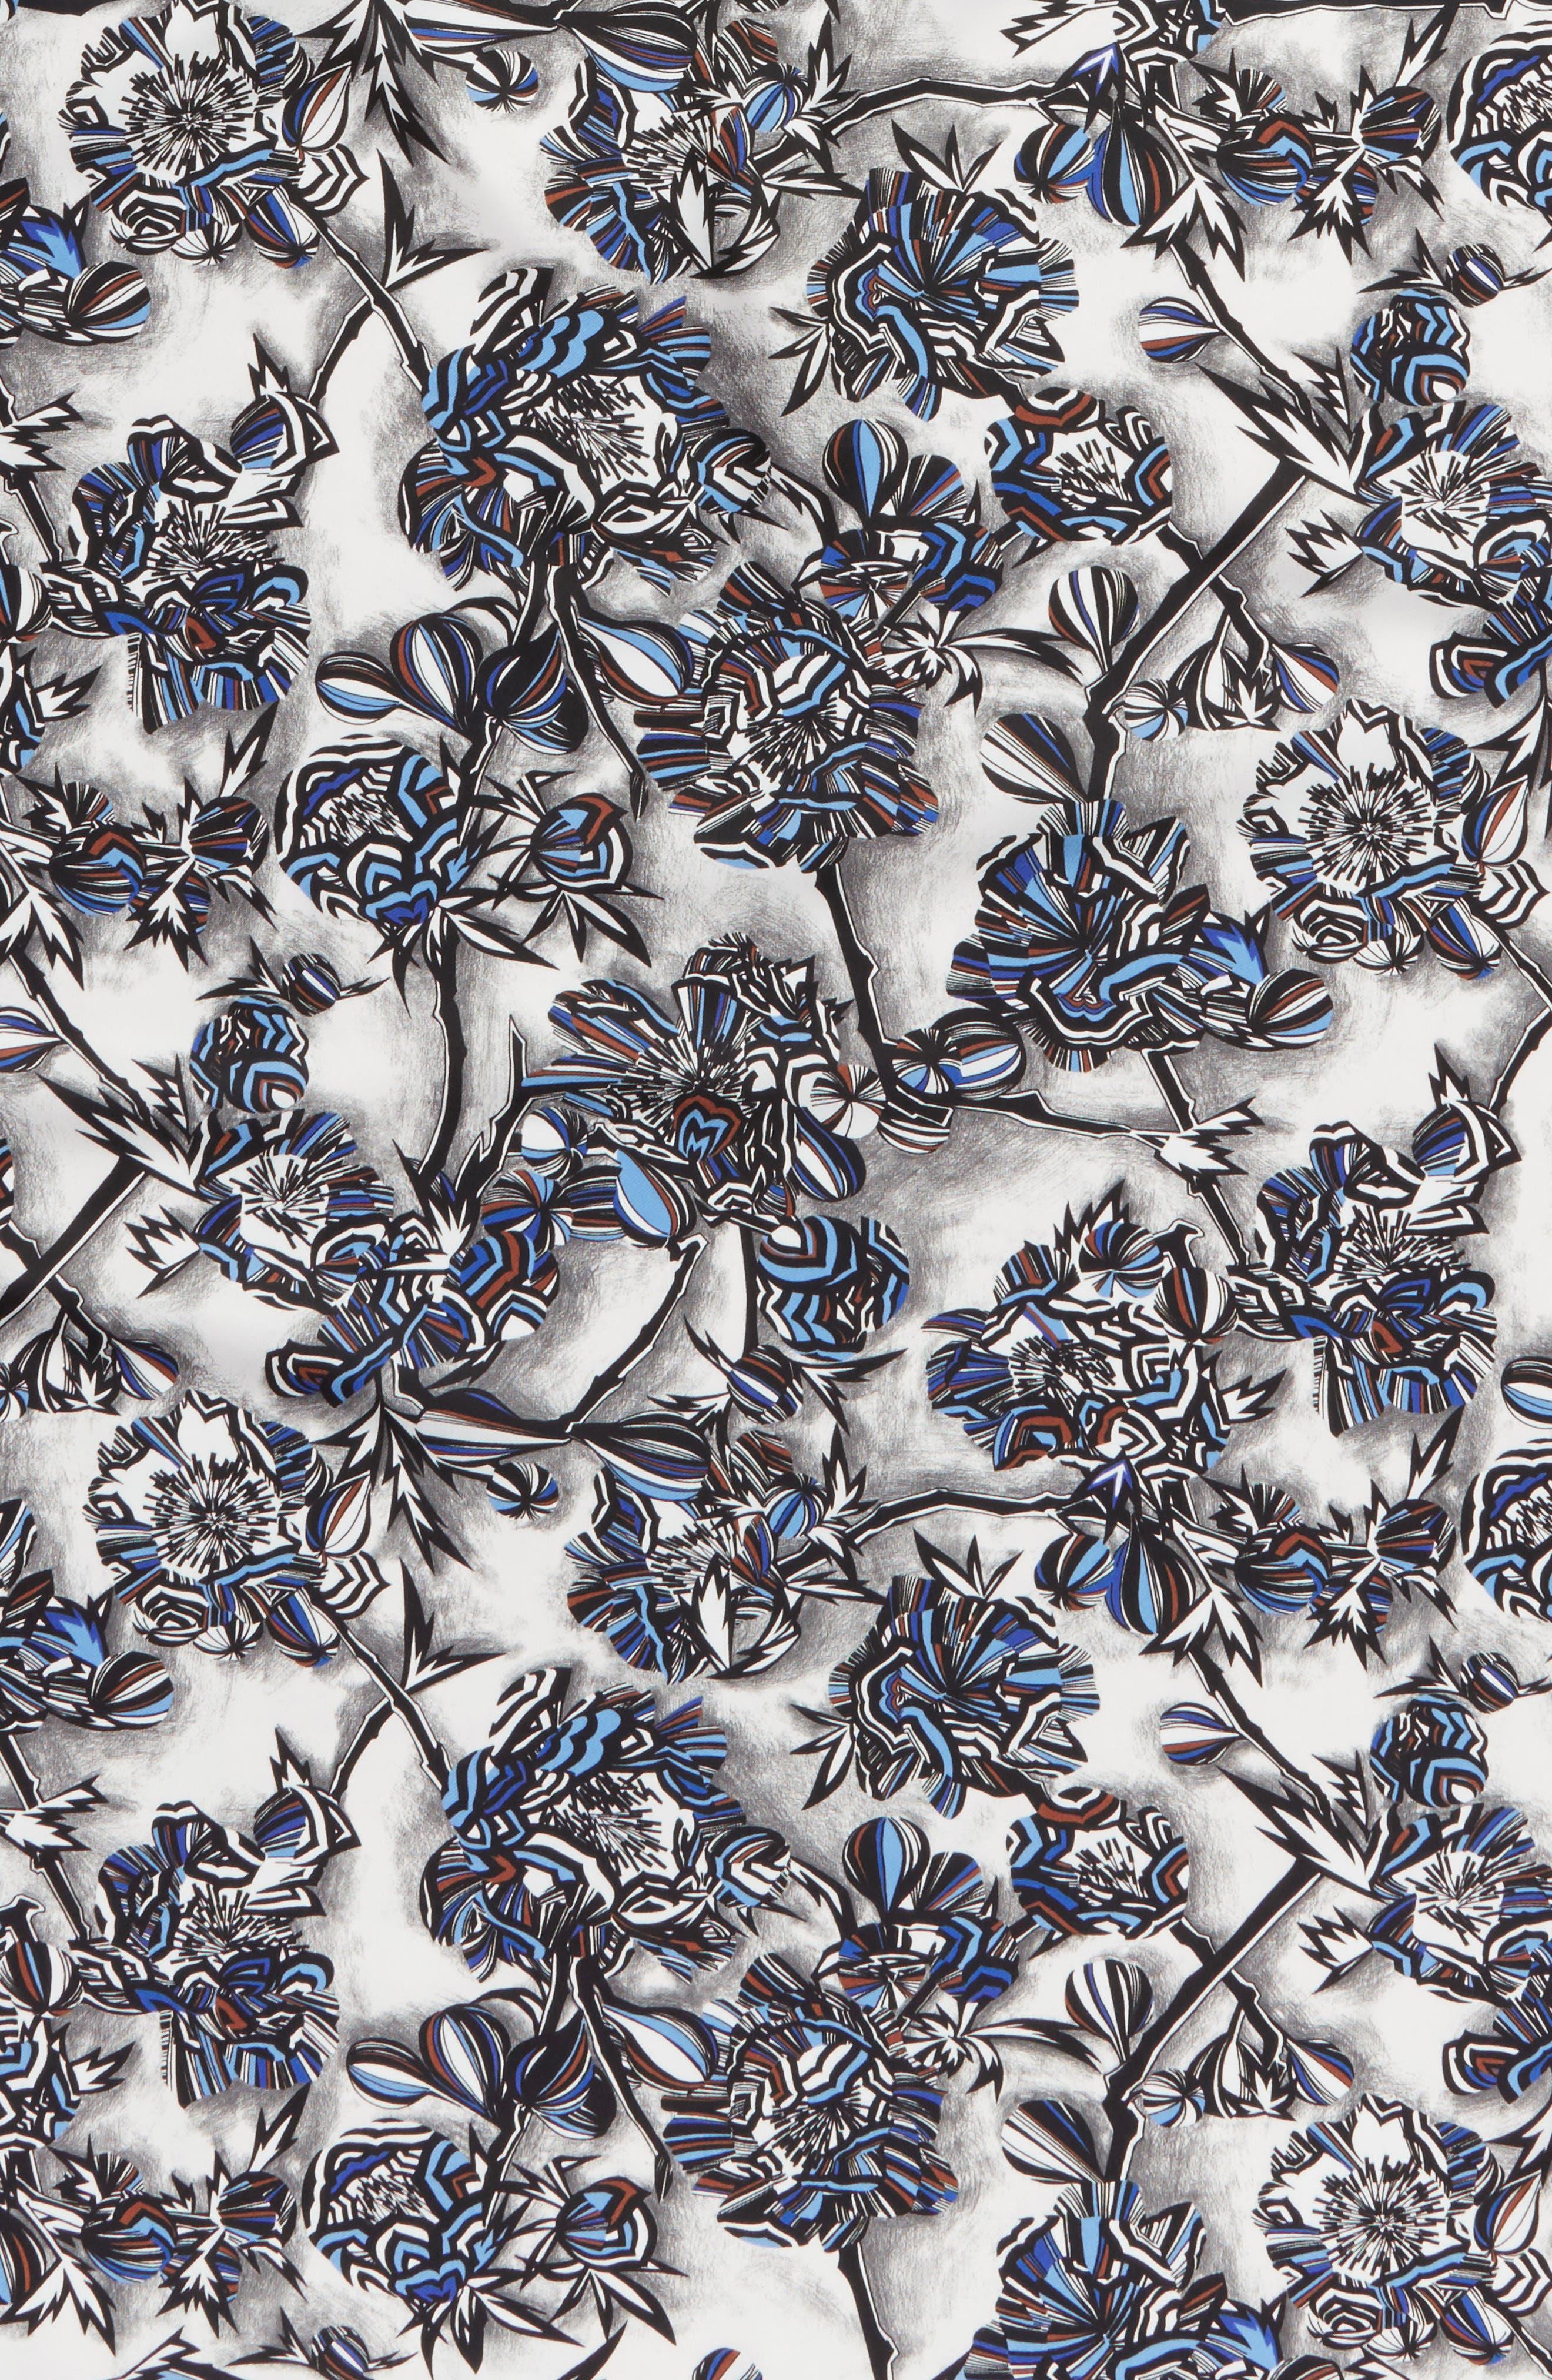 Floral Print Square Silk Scarf,                             Alternate thumbnail 4, color,                             BLUE